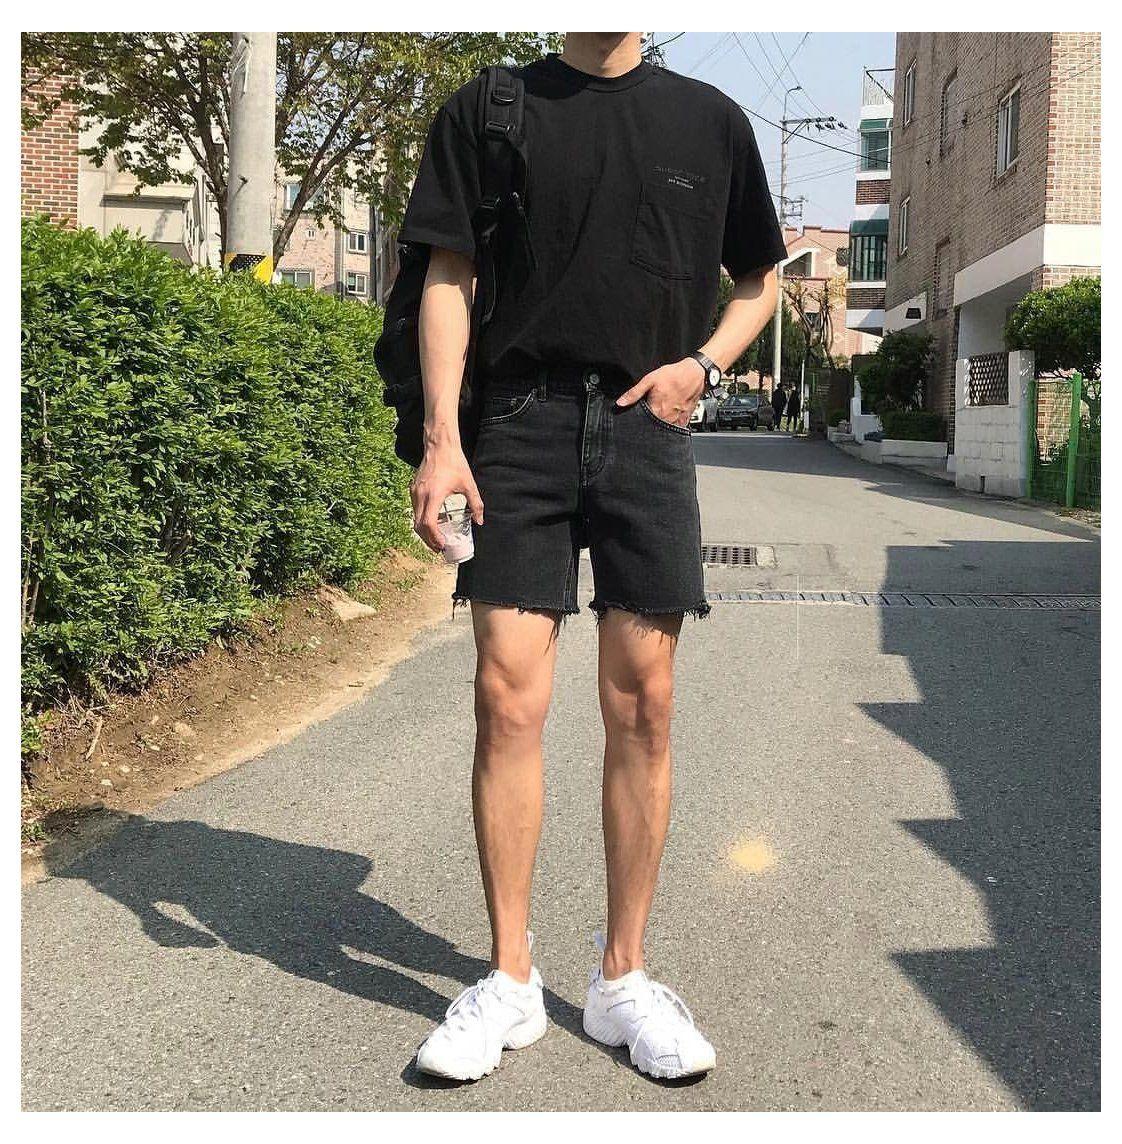 Korean Men Fashion Summer Stunning Spring Korean Fashion 856 Springkoreanfashion In 2020 Asian Men Fashion Kpop Fashion Men Men Fashion Casual Outfits